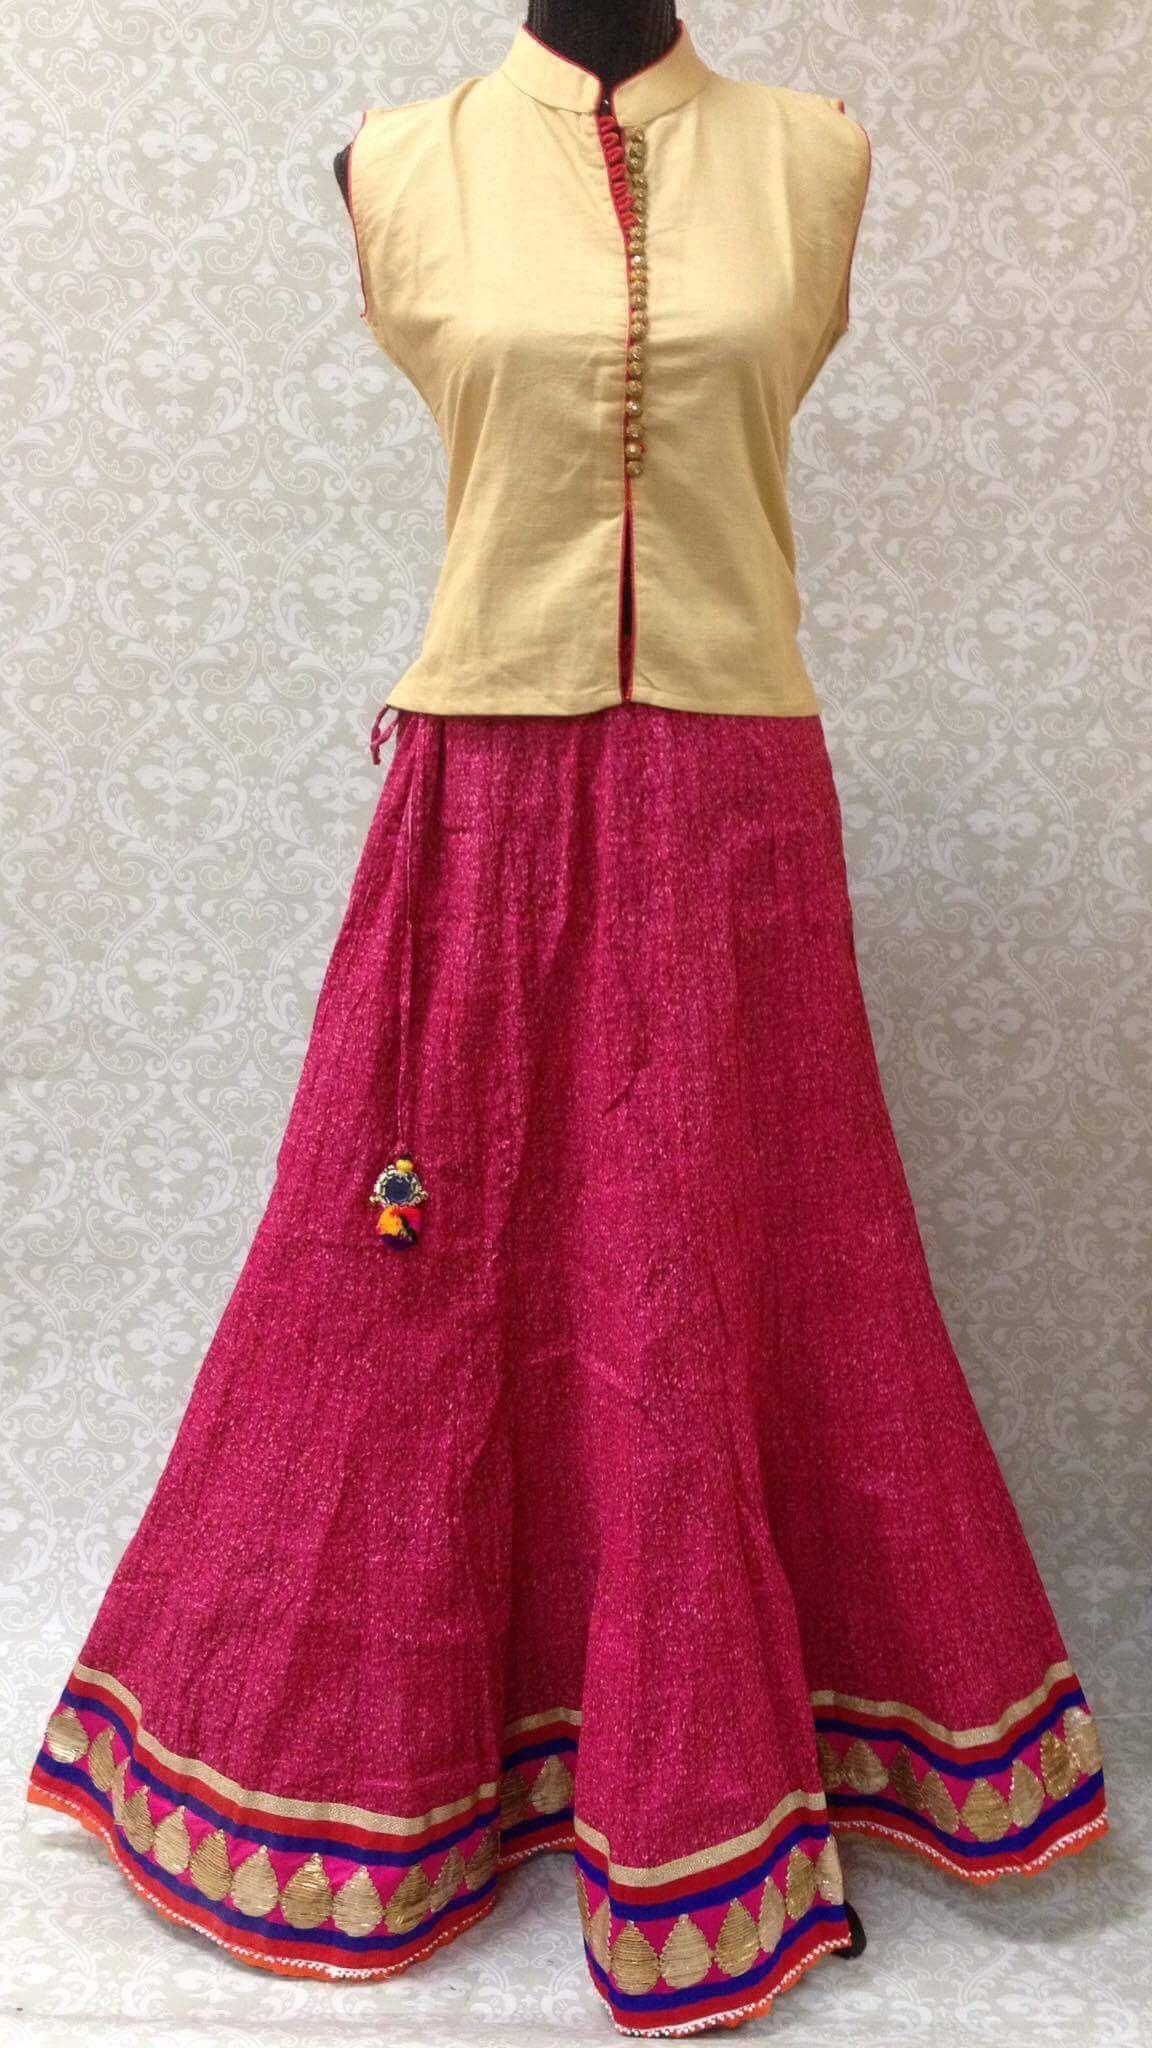 Long Cotton Skirt | Cotton skirt, Skirts and Cotton